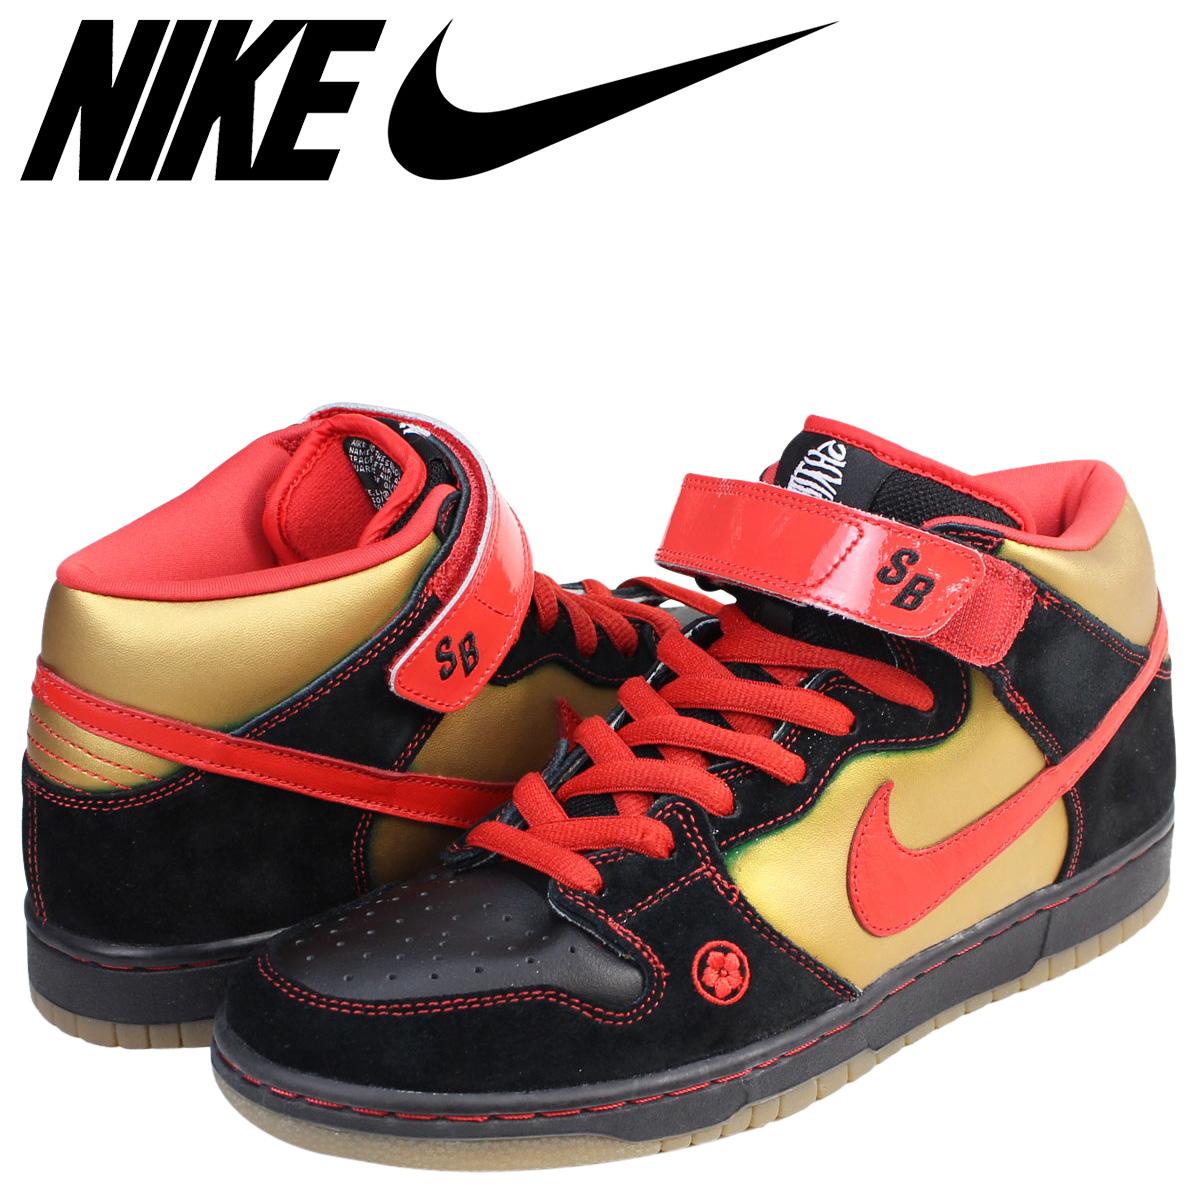 hot sale online a2722 baee3 NIKE Nike SB dunk sneakers DUNK MID PRO MONEY CAT men 314,383-061 shoes  black black